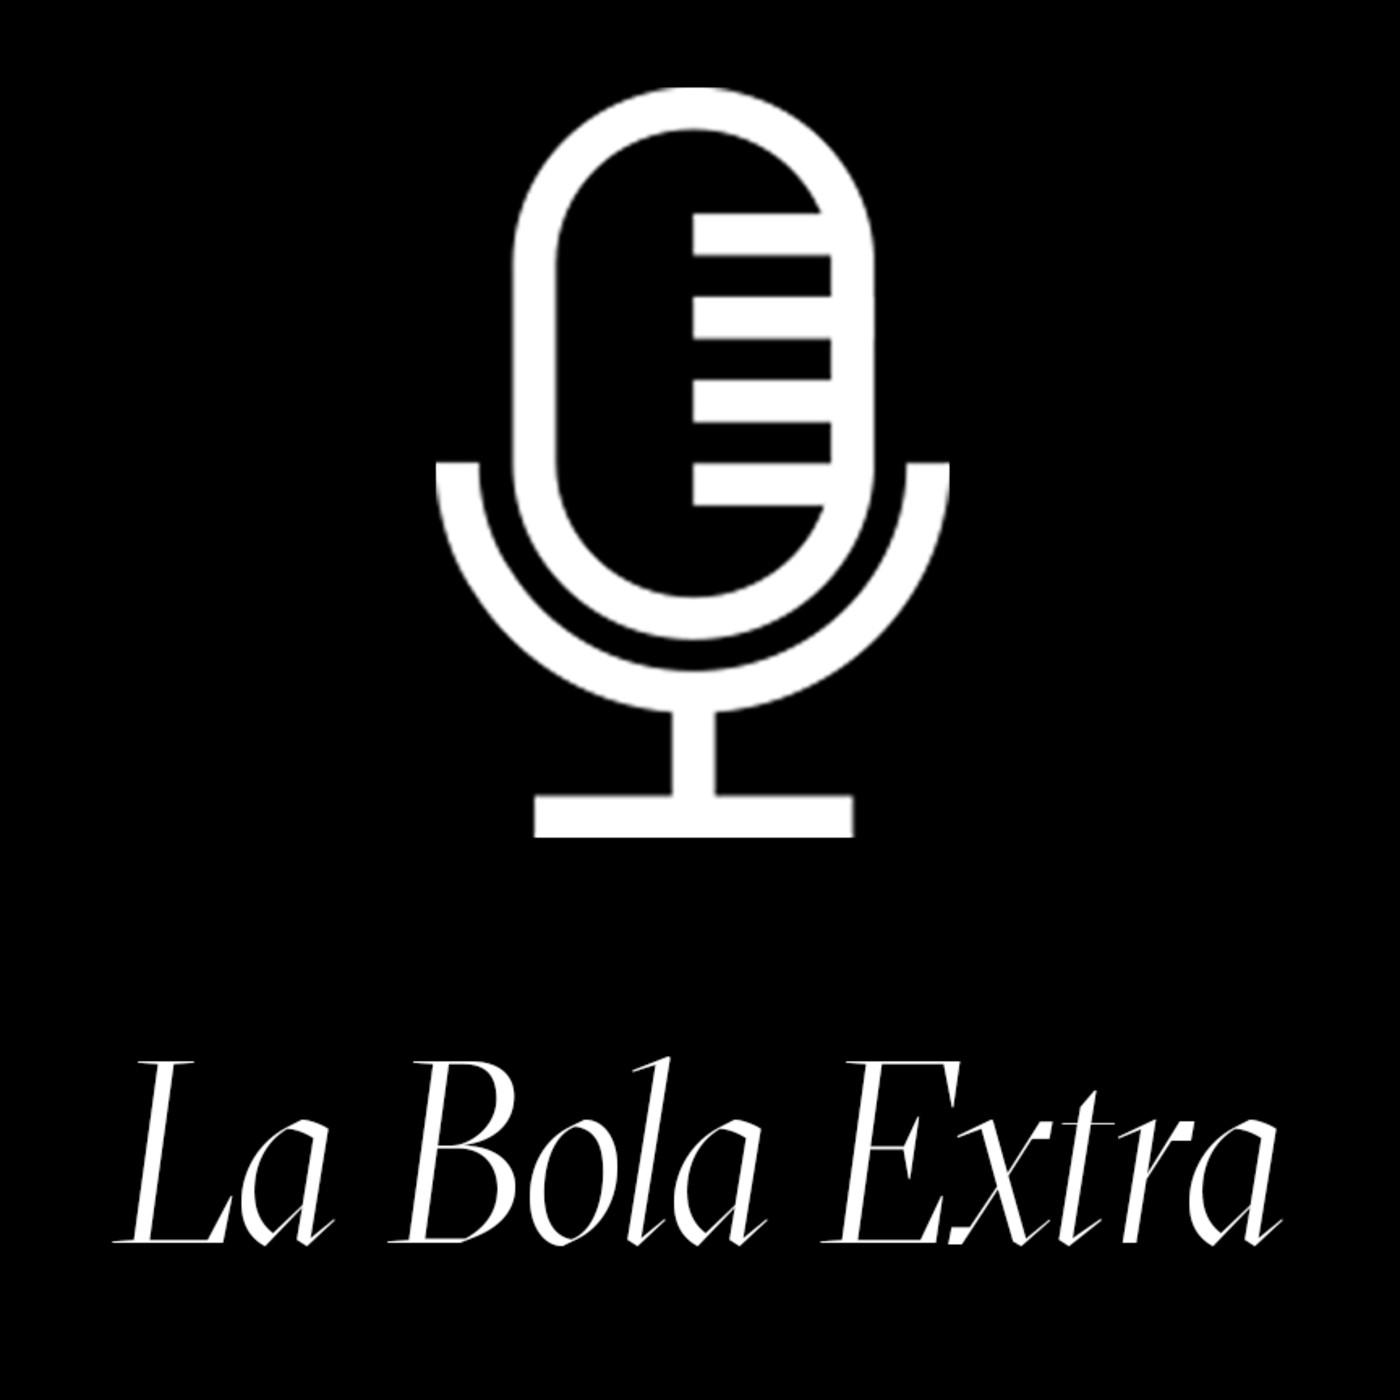 La Bola Extra - Moda Sostenible (Diciembre 2020)